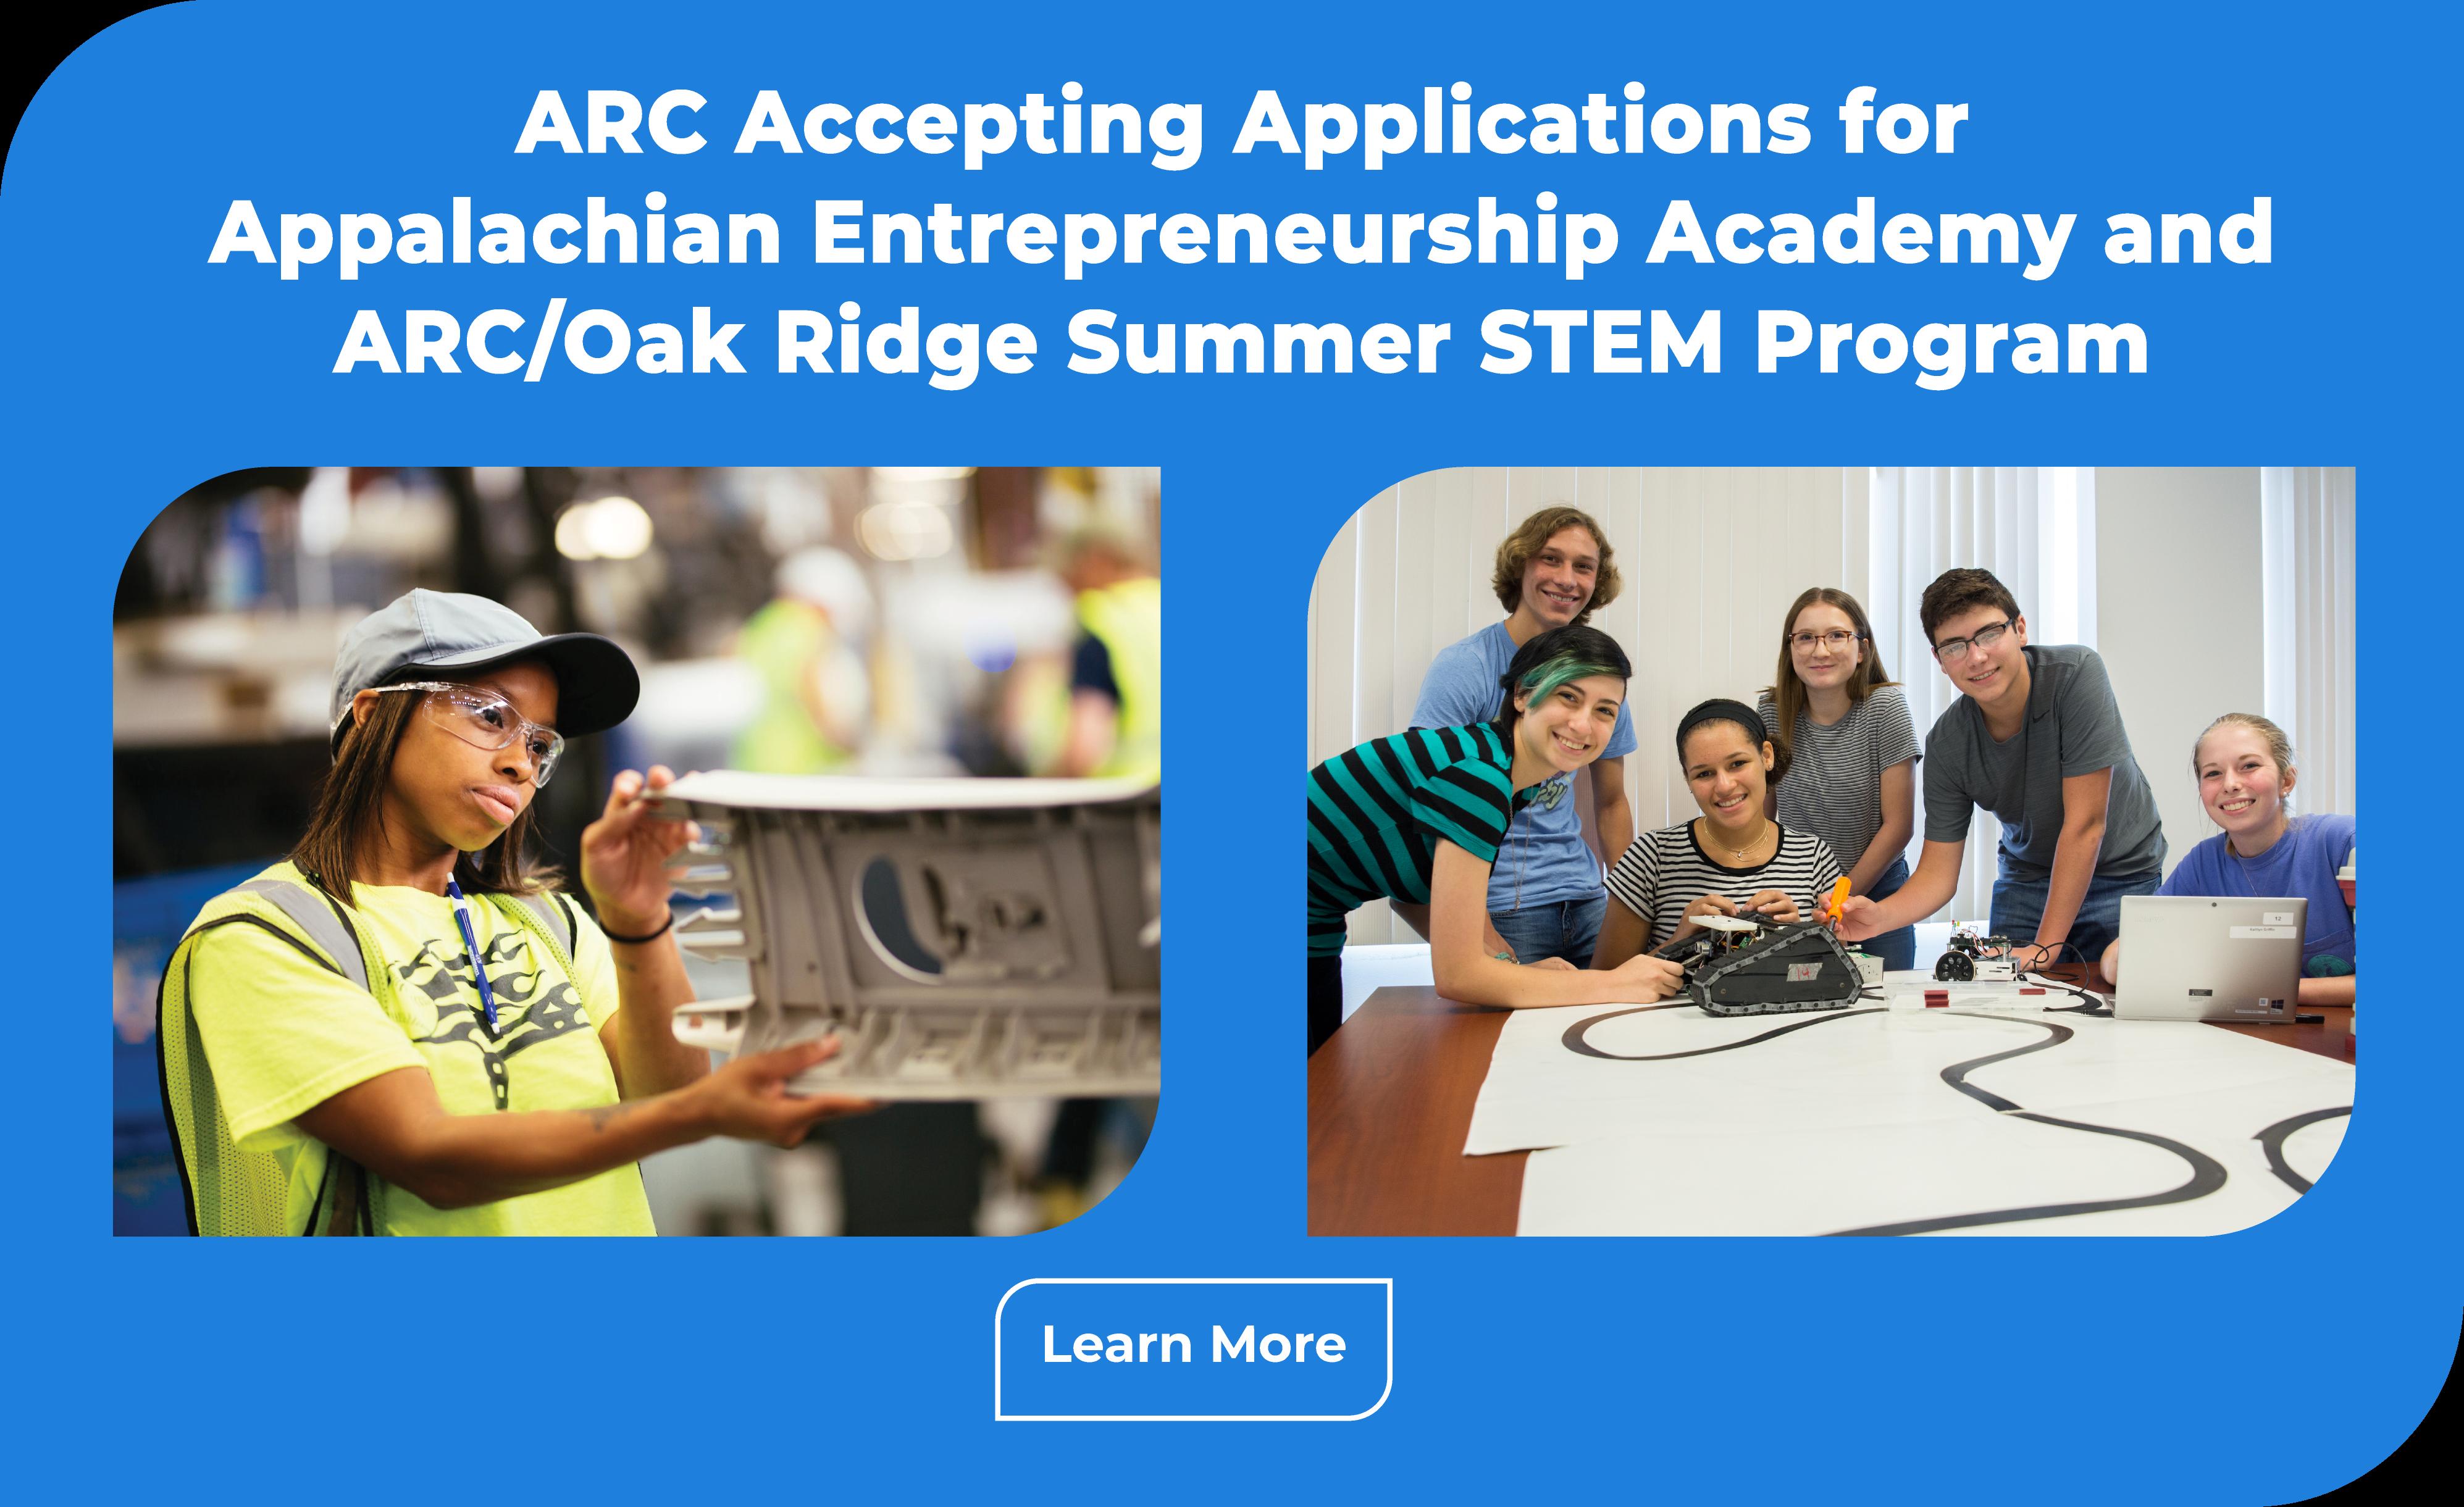 ARC Seeks Applicants for Entrepreneurship and STEM Programs